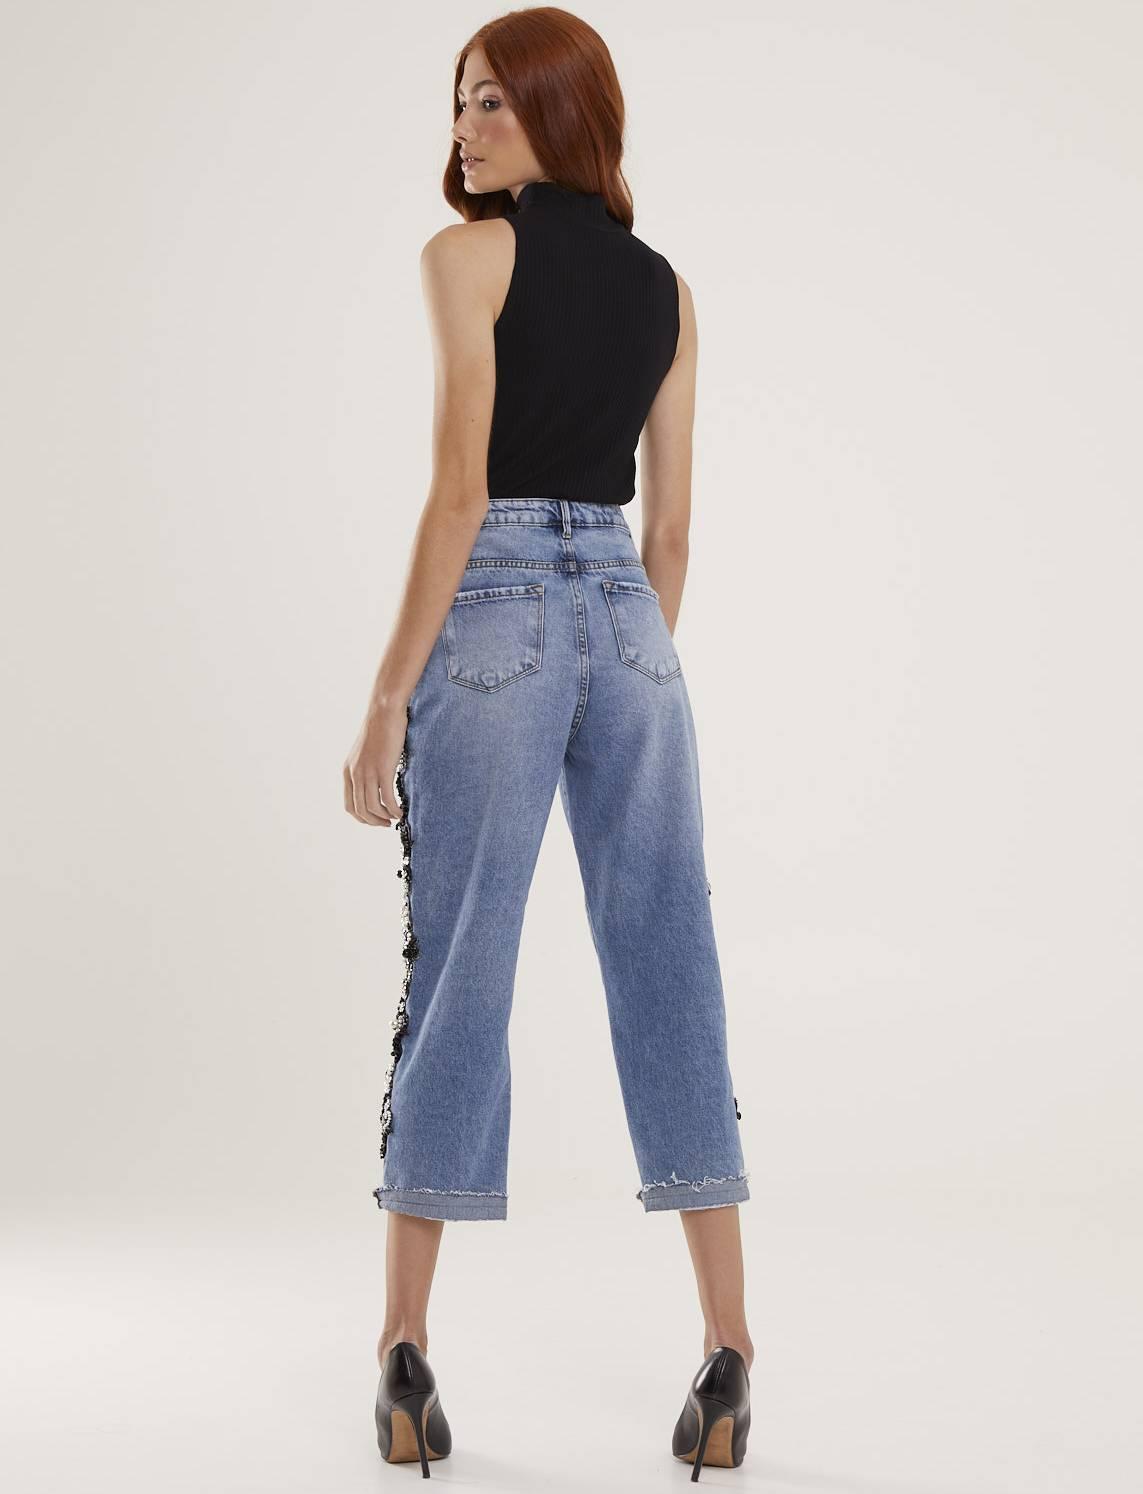 Calça Jeans Feminina Bordada Atelier Ônix